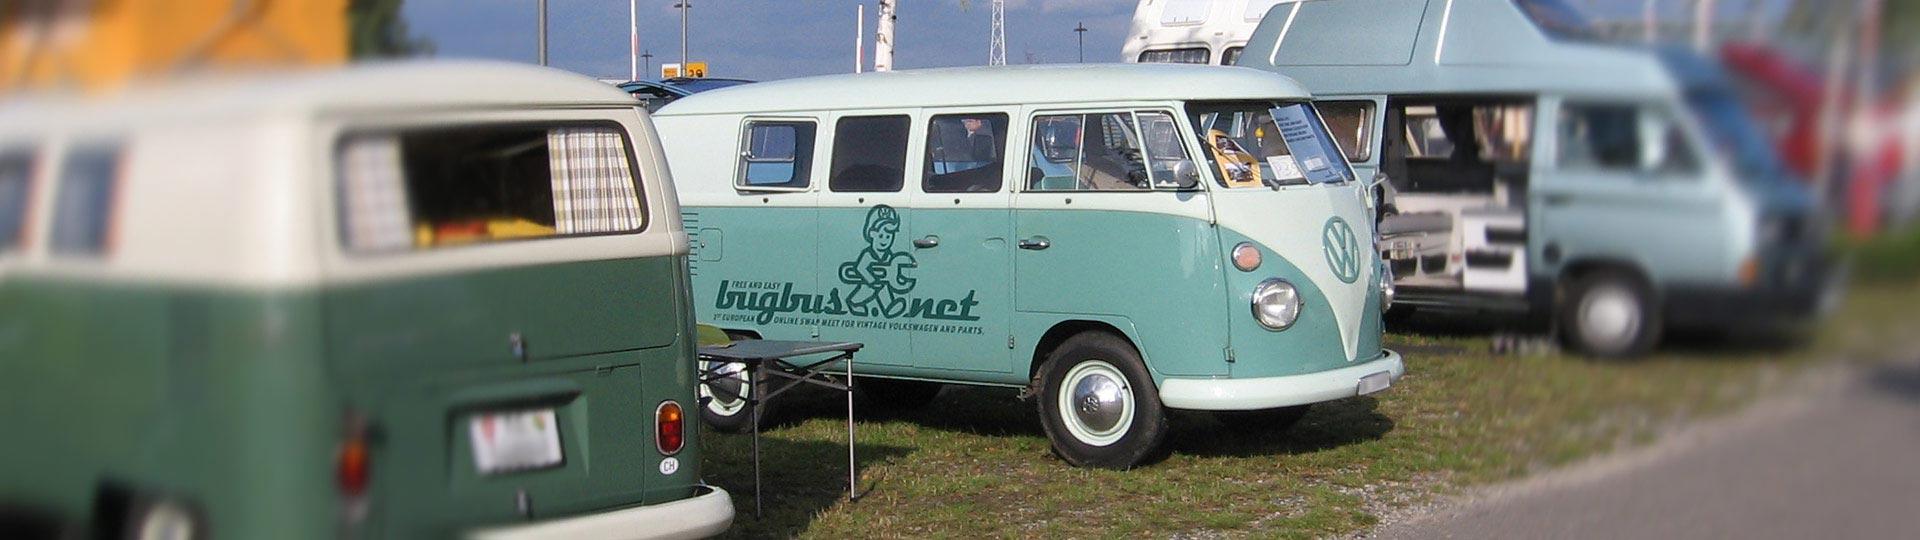 bus kaufen 1109 best images about vw bus on pinterest. Black Bedroom Furniture Sets. Home Design Ideas